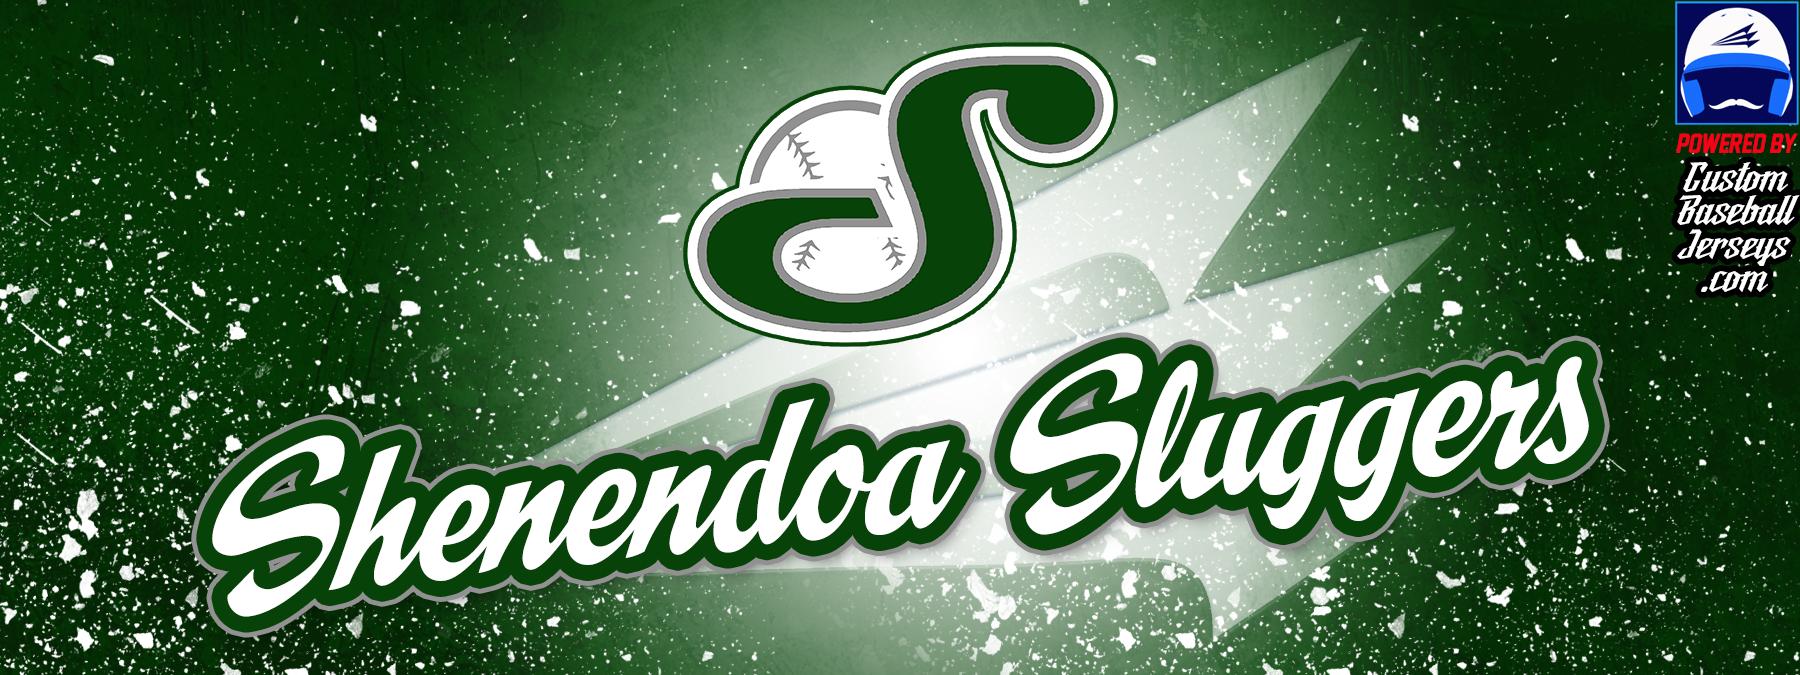 07d85adf1 Shenendoa Sluggers Custom Throwback Baseball Jerseys - Custom Baseball  Jerseys.com - The World s  1 Choice for Custom Baseball Uniforms